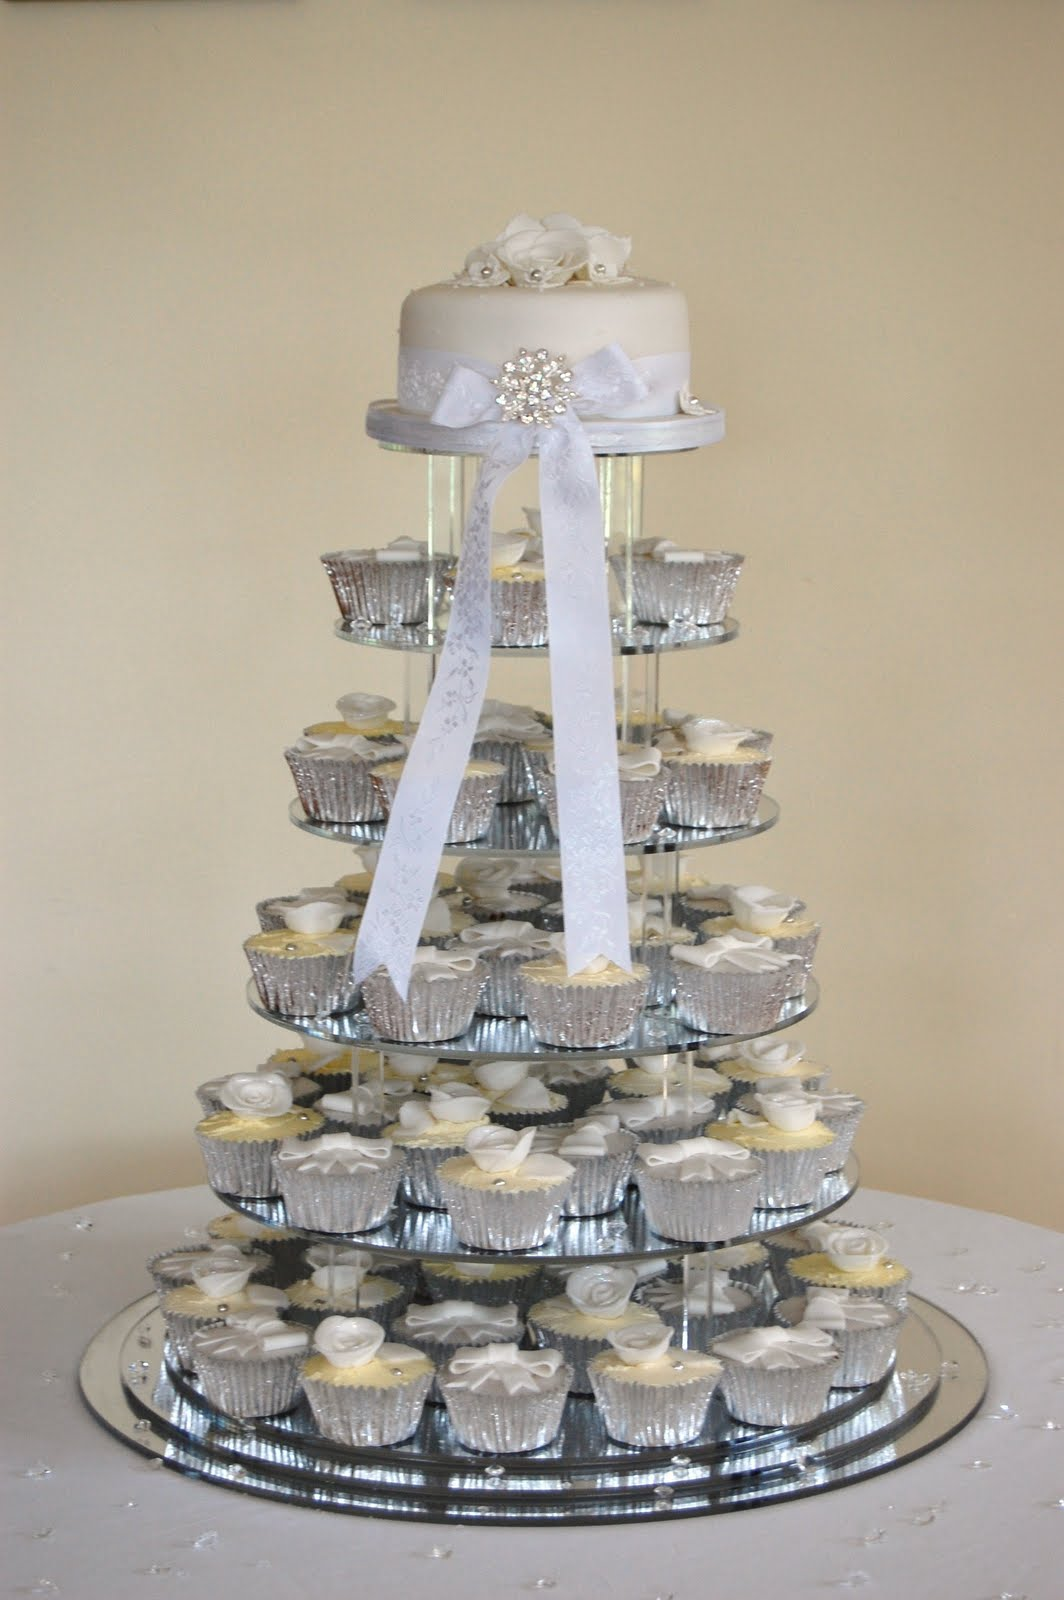 iced sarena and jason 39 s wedding cake. Black Bedroom Furniture Sets. Home Design Ideas